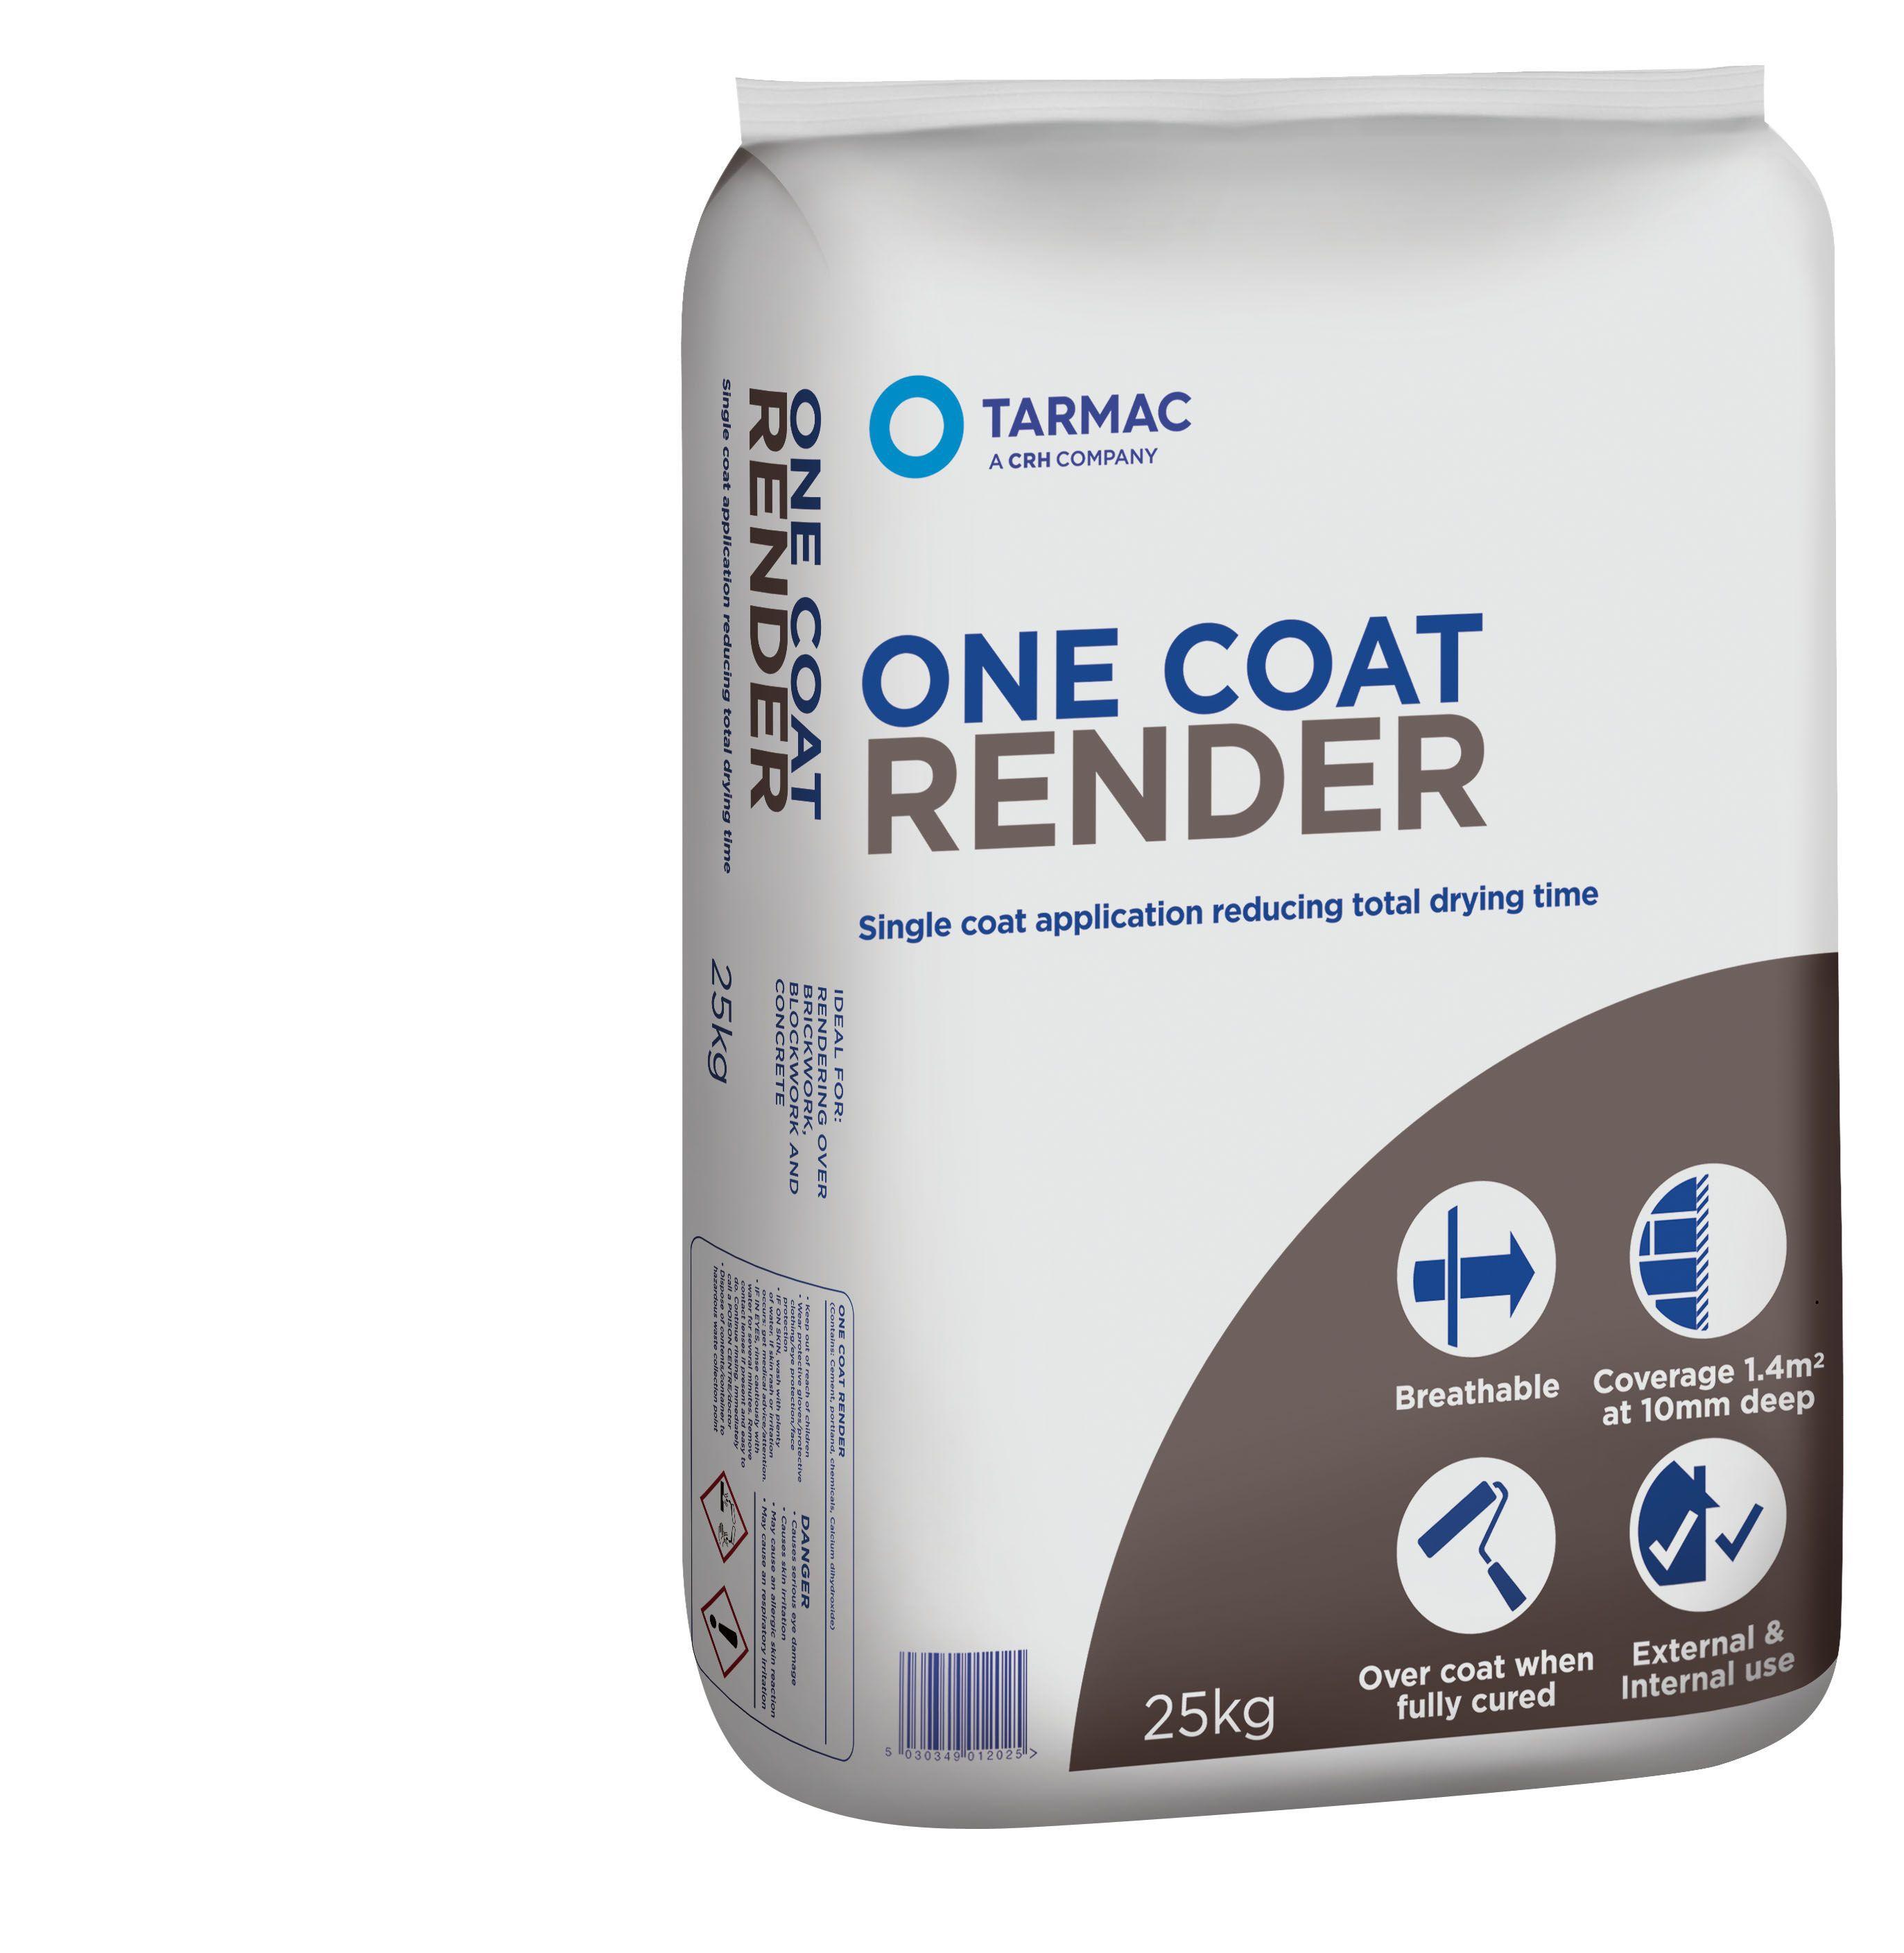 Tarmac One Coat Ready To Use Render 25kg Bag | Departments | DIY At Bu0026Q